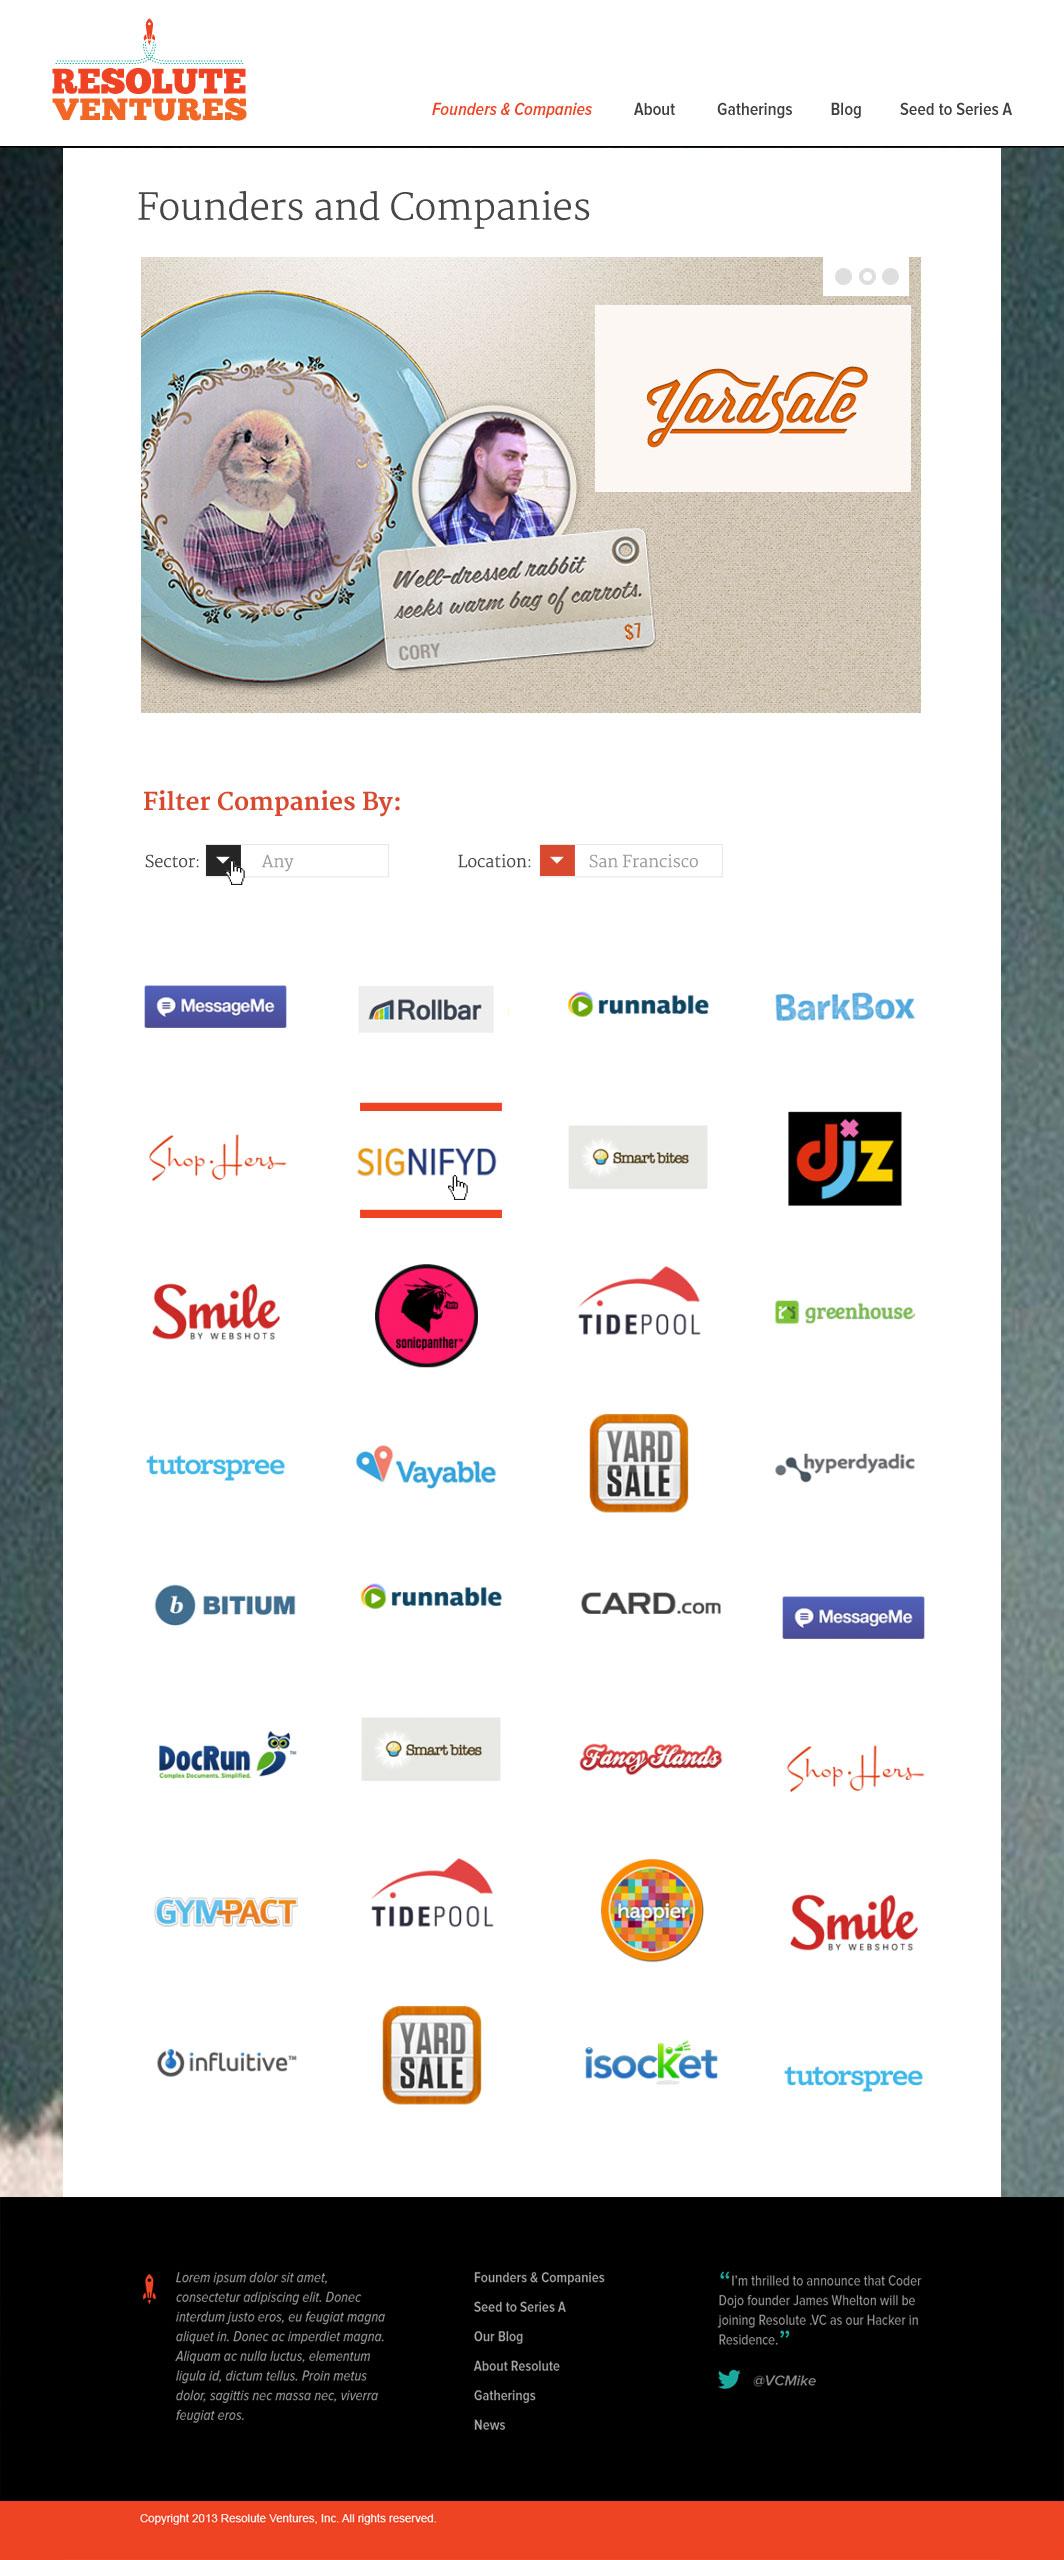 STP_FoundersCompanies.jpg